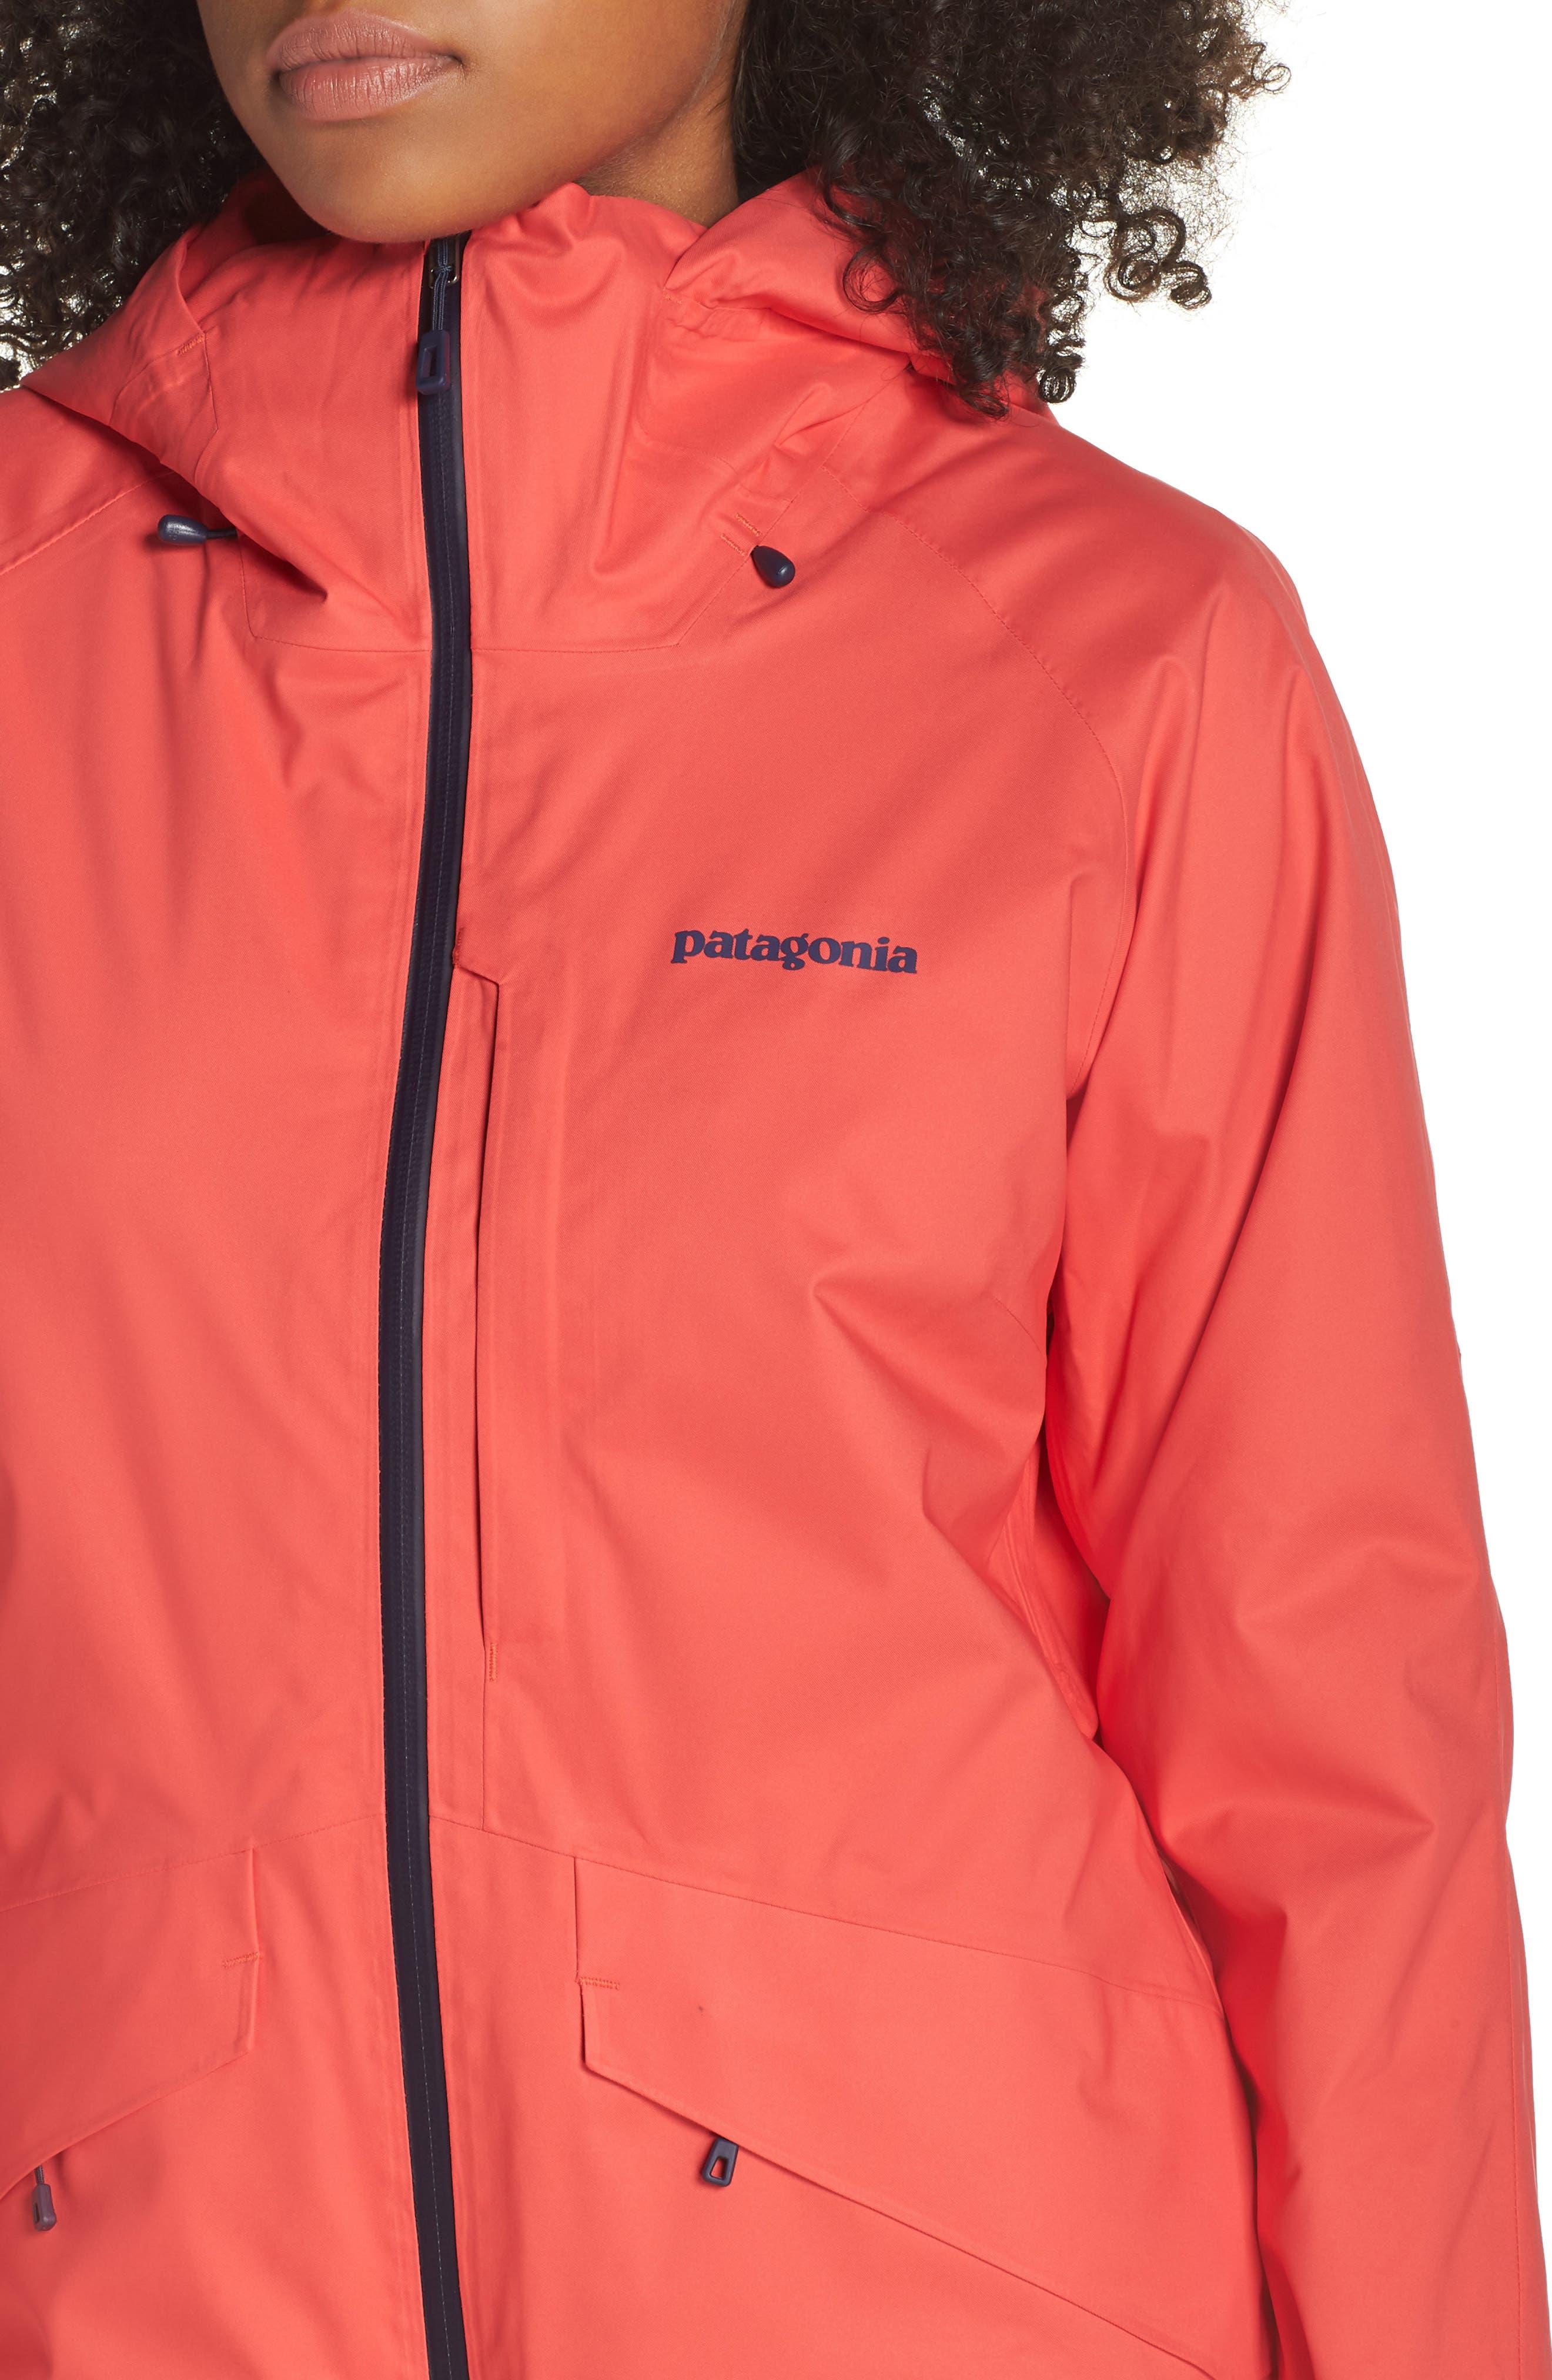 PATAGONIA,                             Snowbelle Insulated Ski Jacket,                             Alternate thumbnail 4, color,                             601